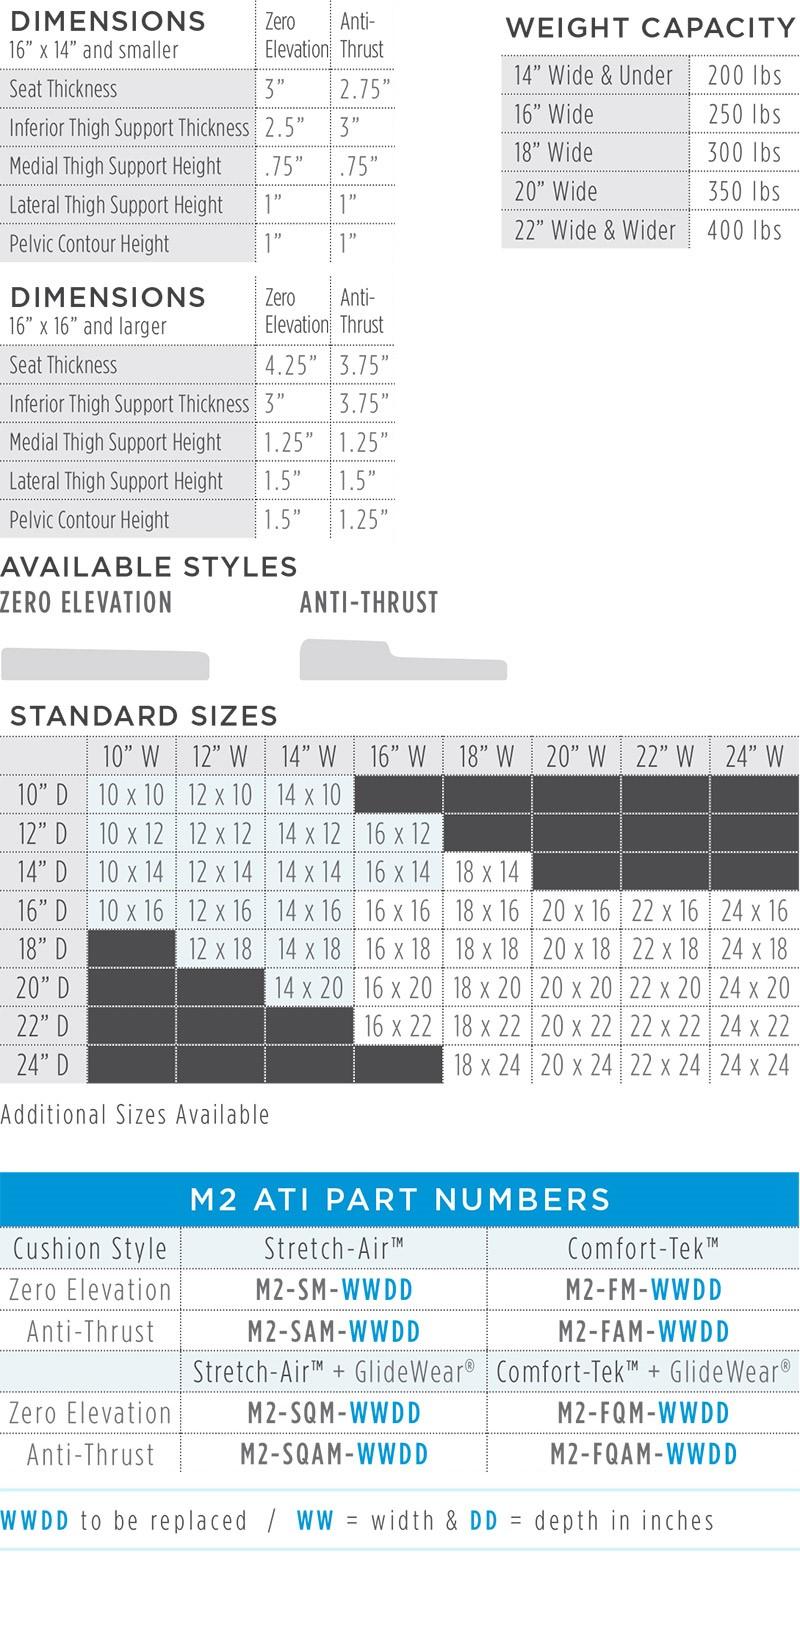 M2 ATI Dimensions